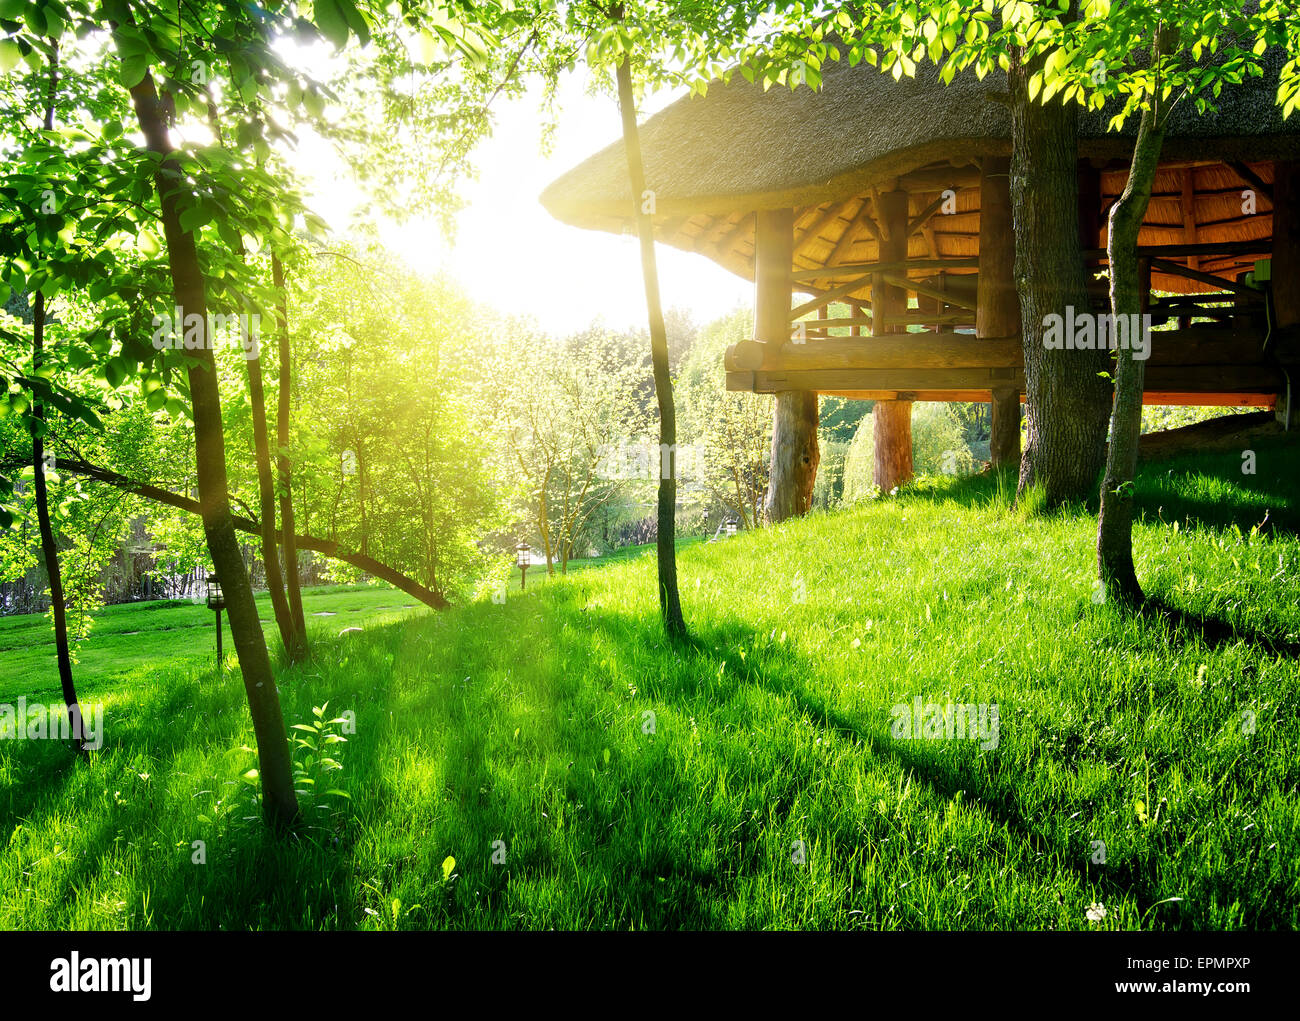 Pavillon zwischen den grünen Bäumen im sonnigen Tag Stockbild